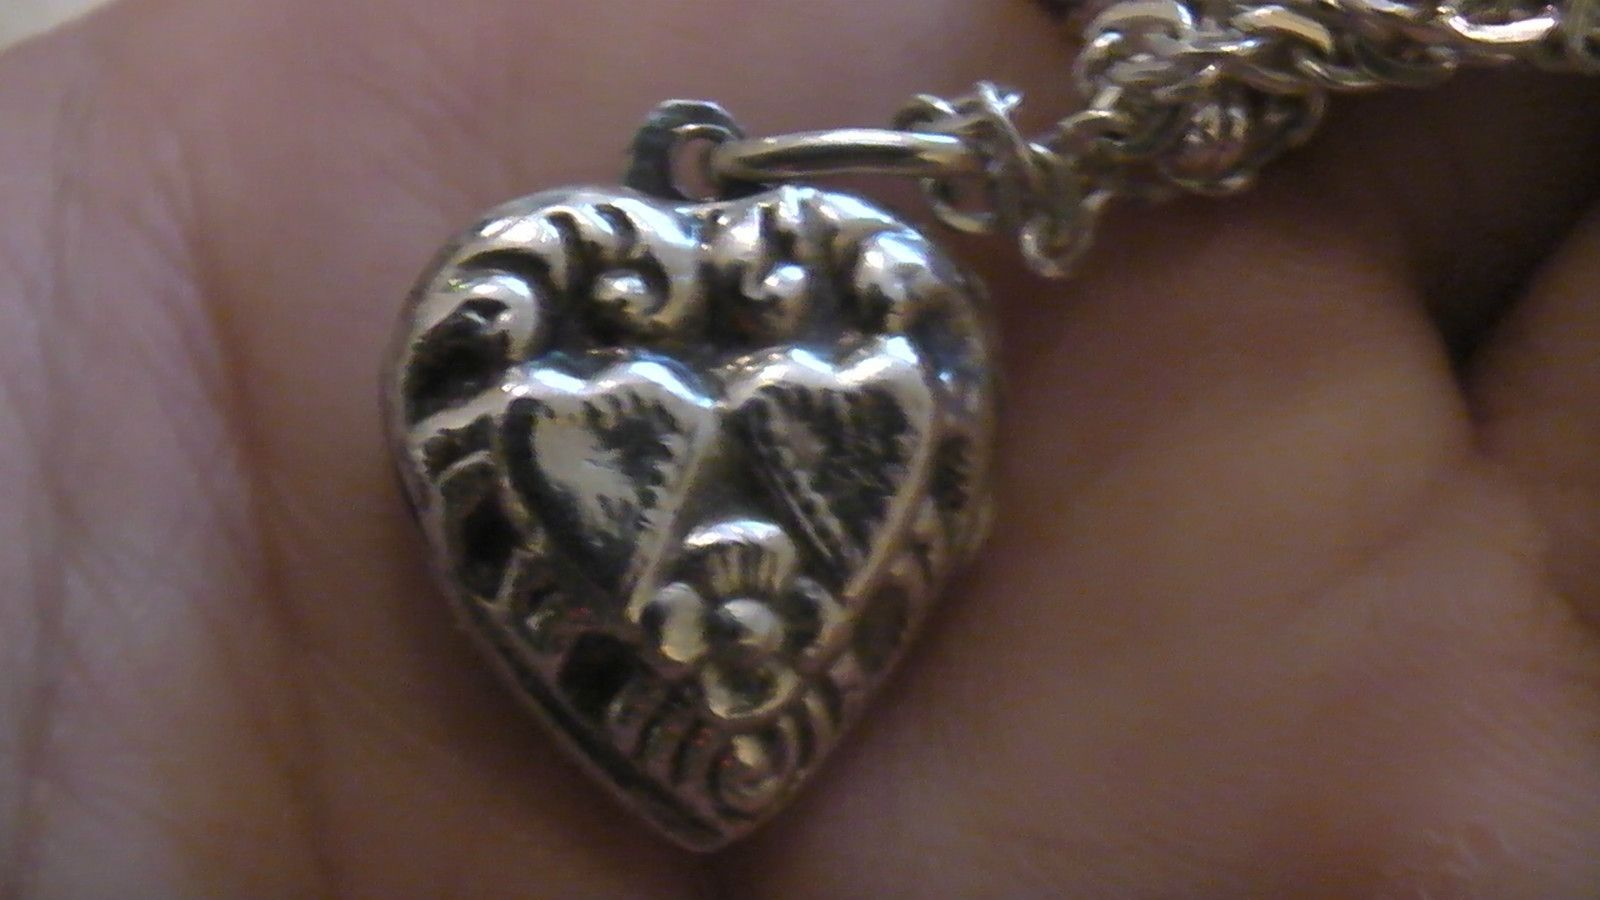 Sterling Silver 925 Locket Engrave Vitctoria Hearts Flower Pendant Necklace Cute | eBay